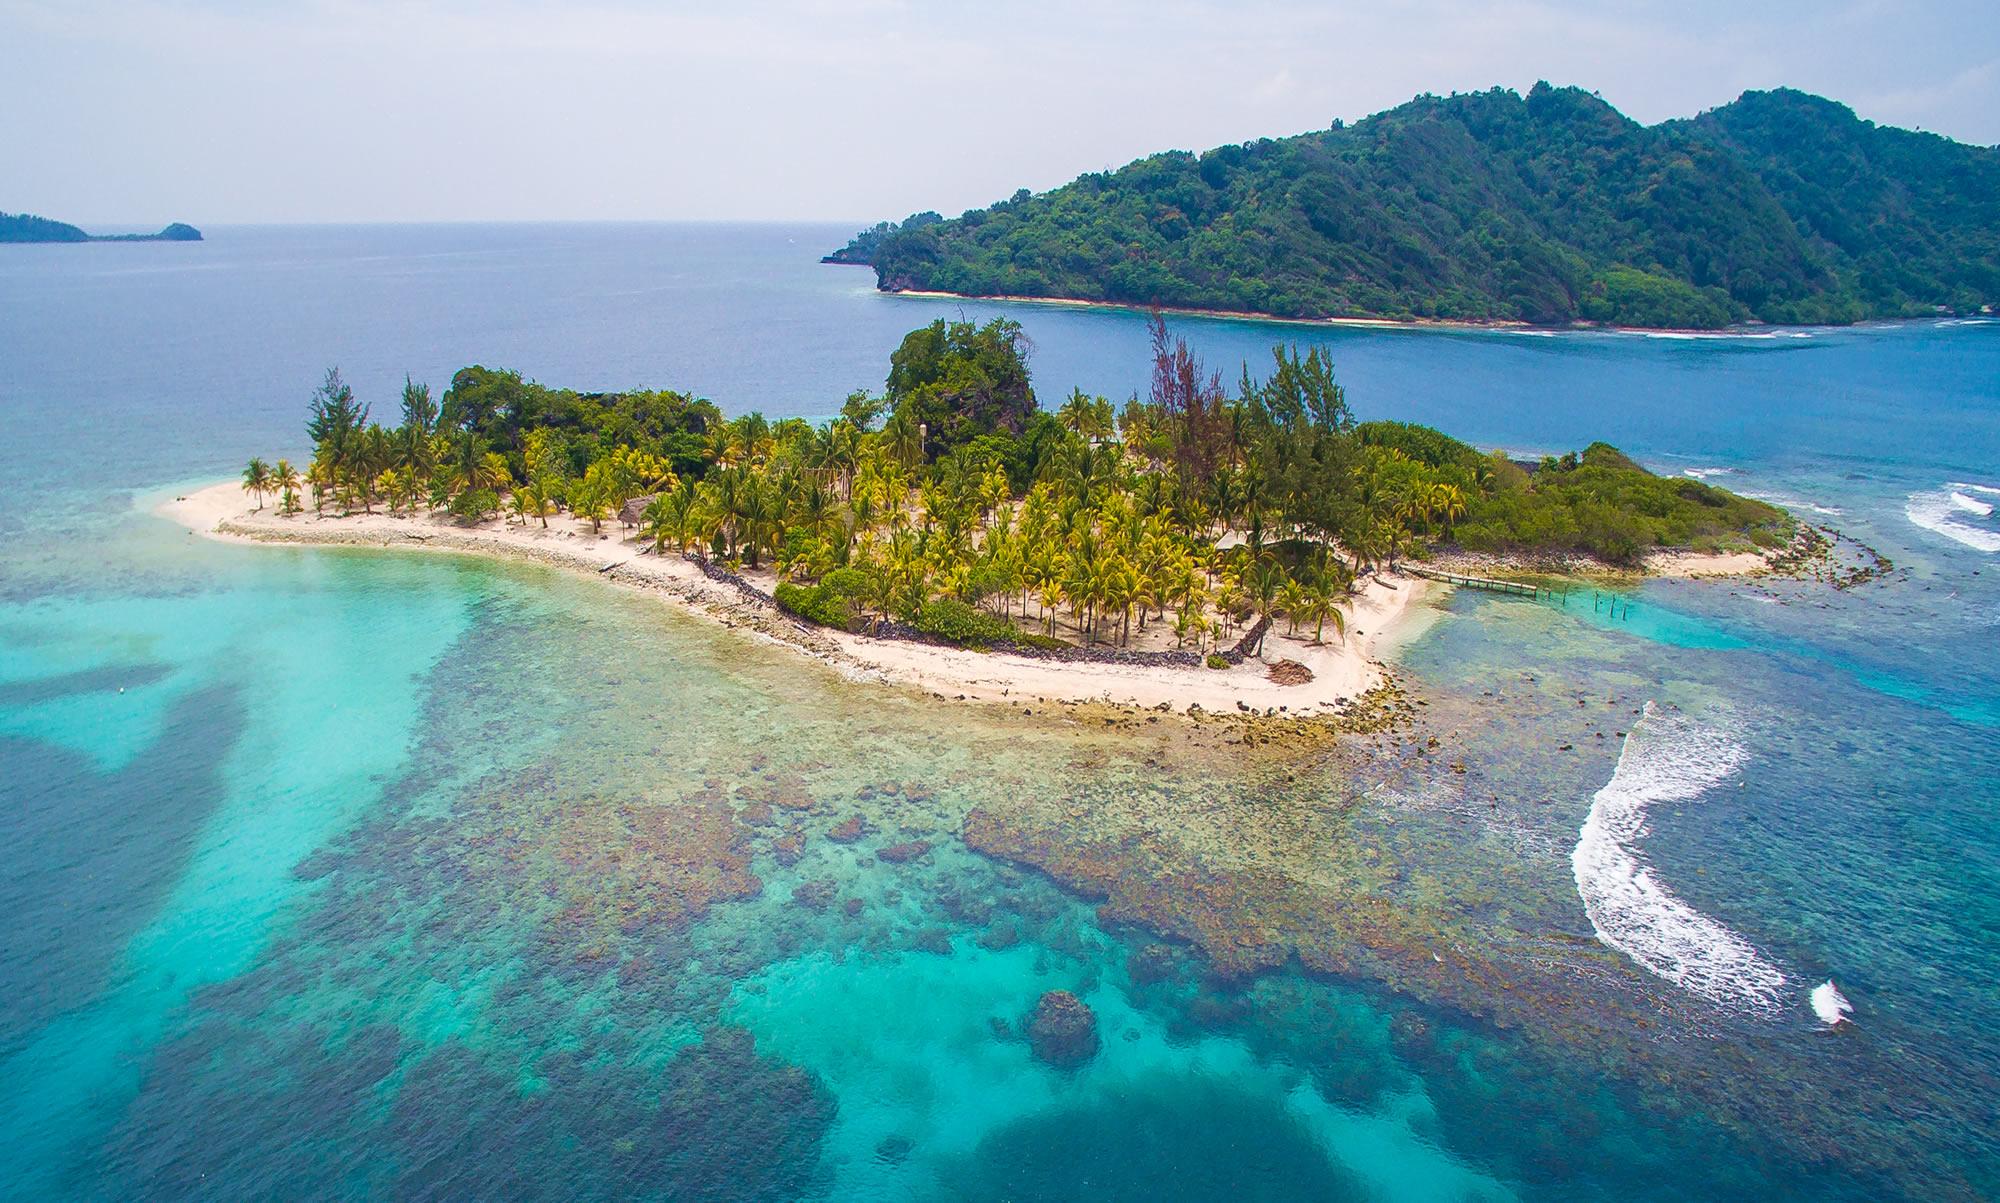 Lambay Cay - Honduras, Central America - Private Islands ...